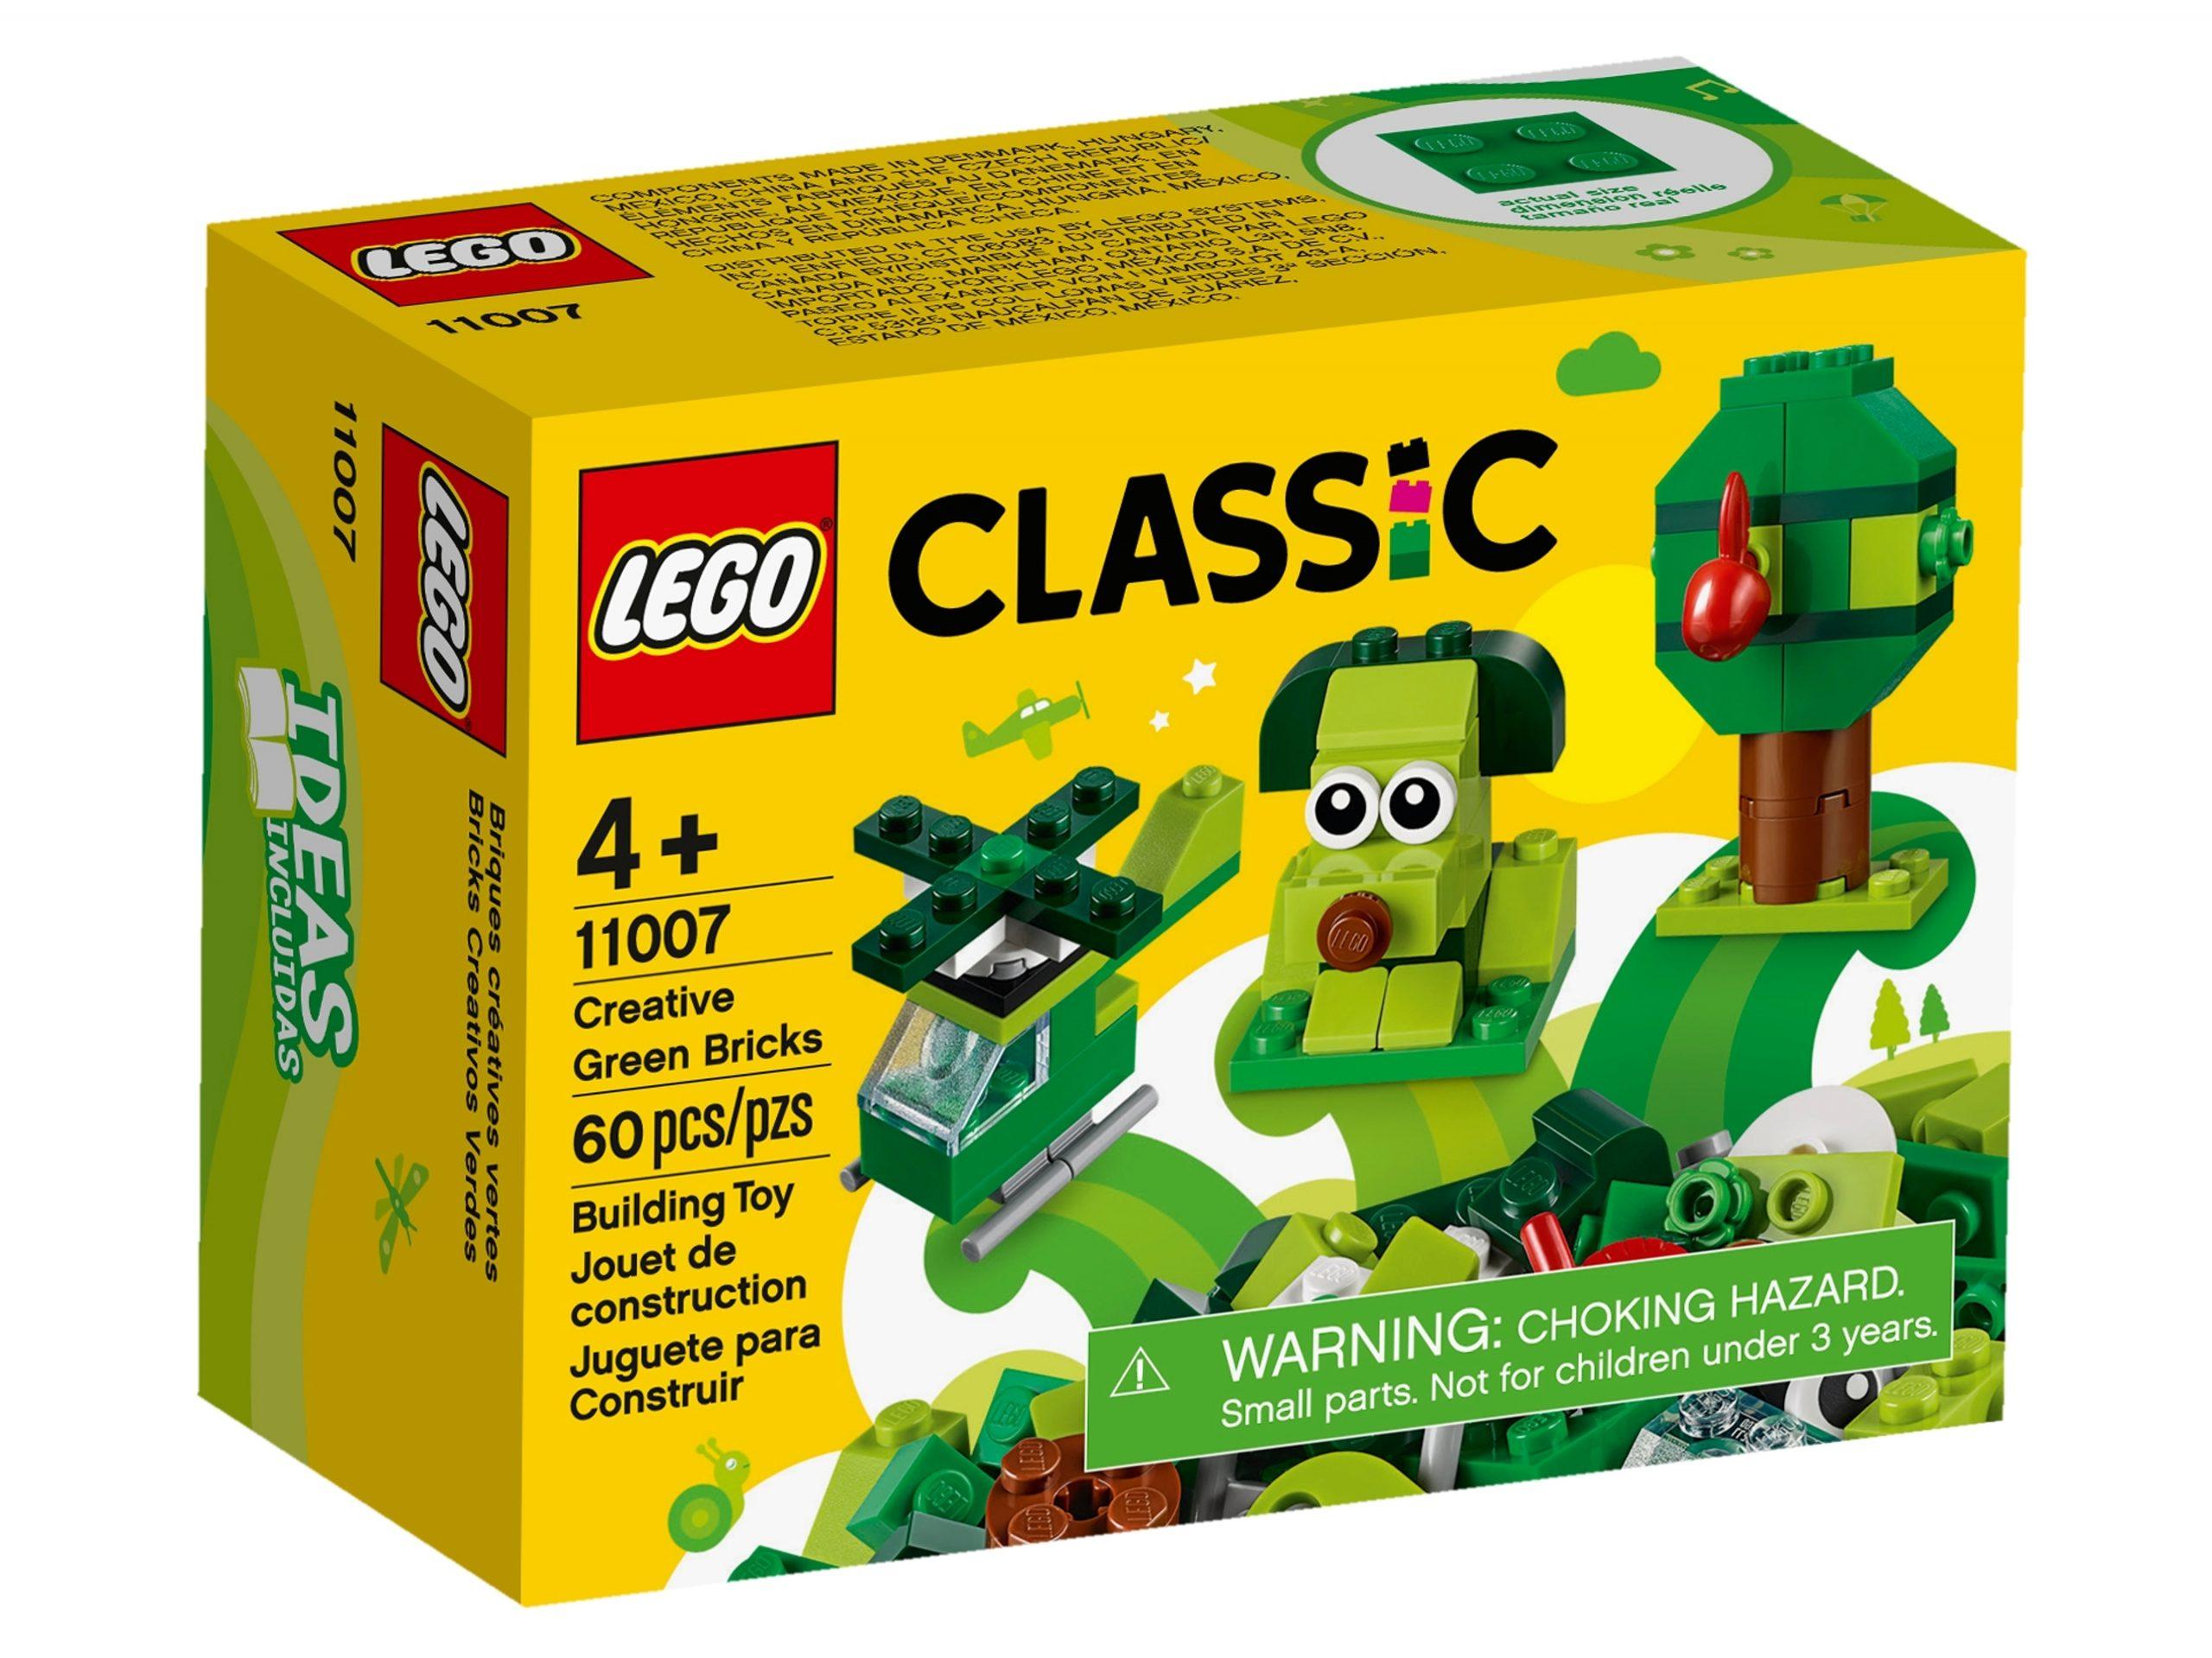 lego 11007 briques creatives vertes scaled